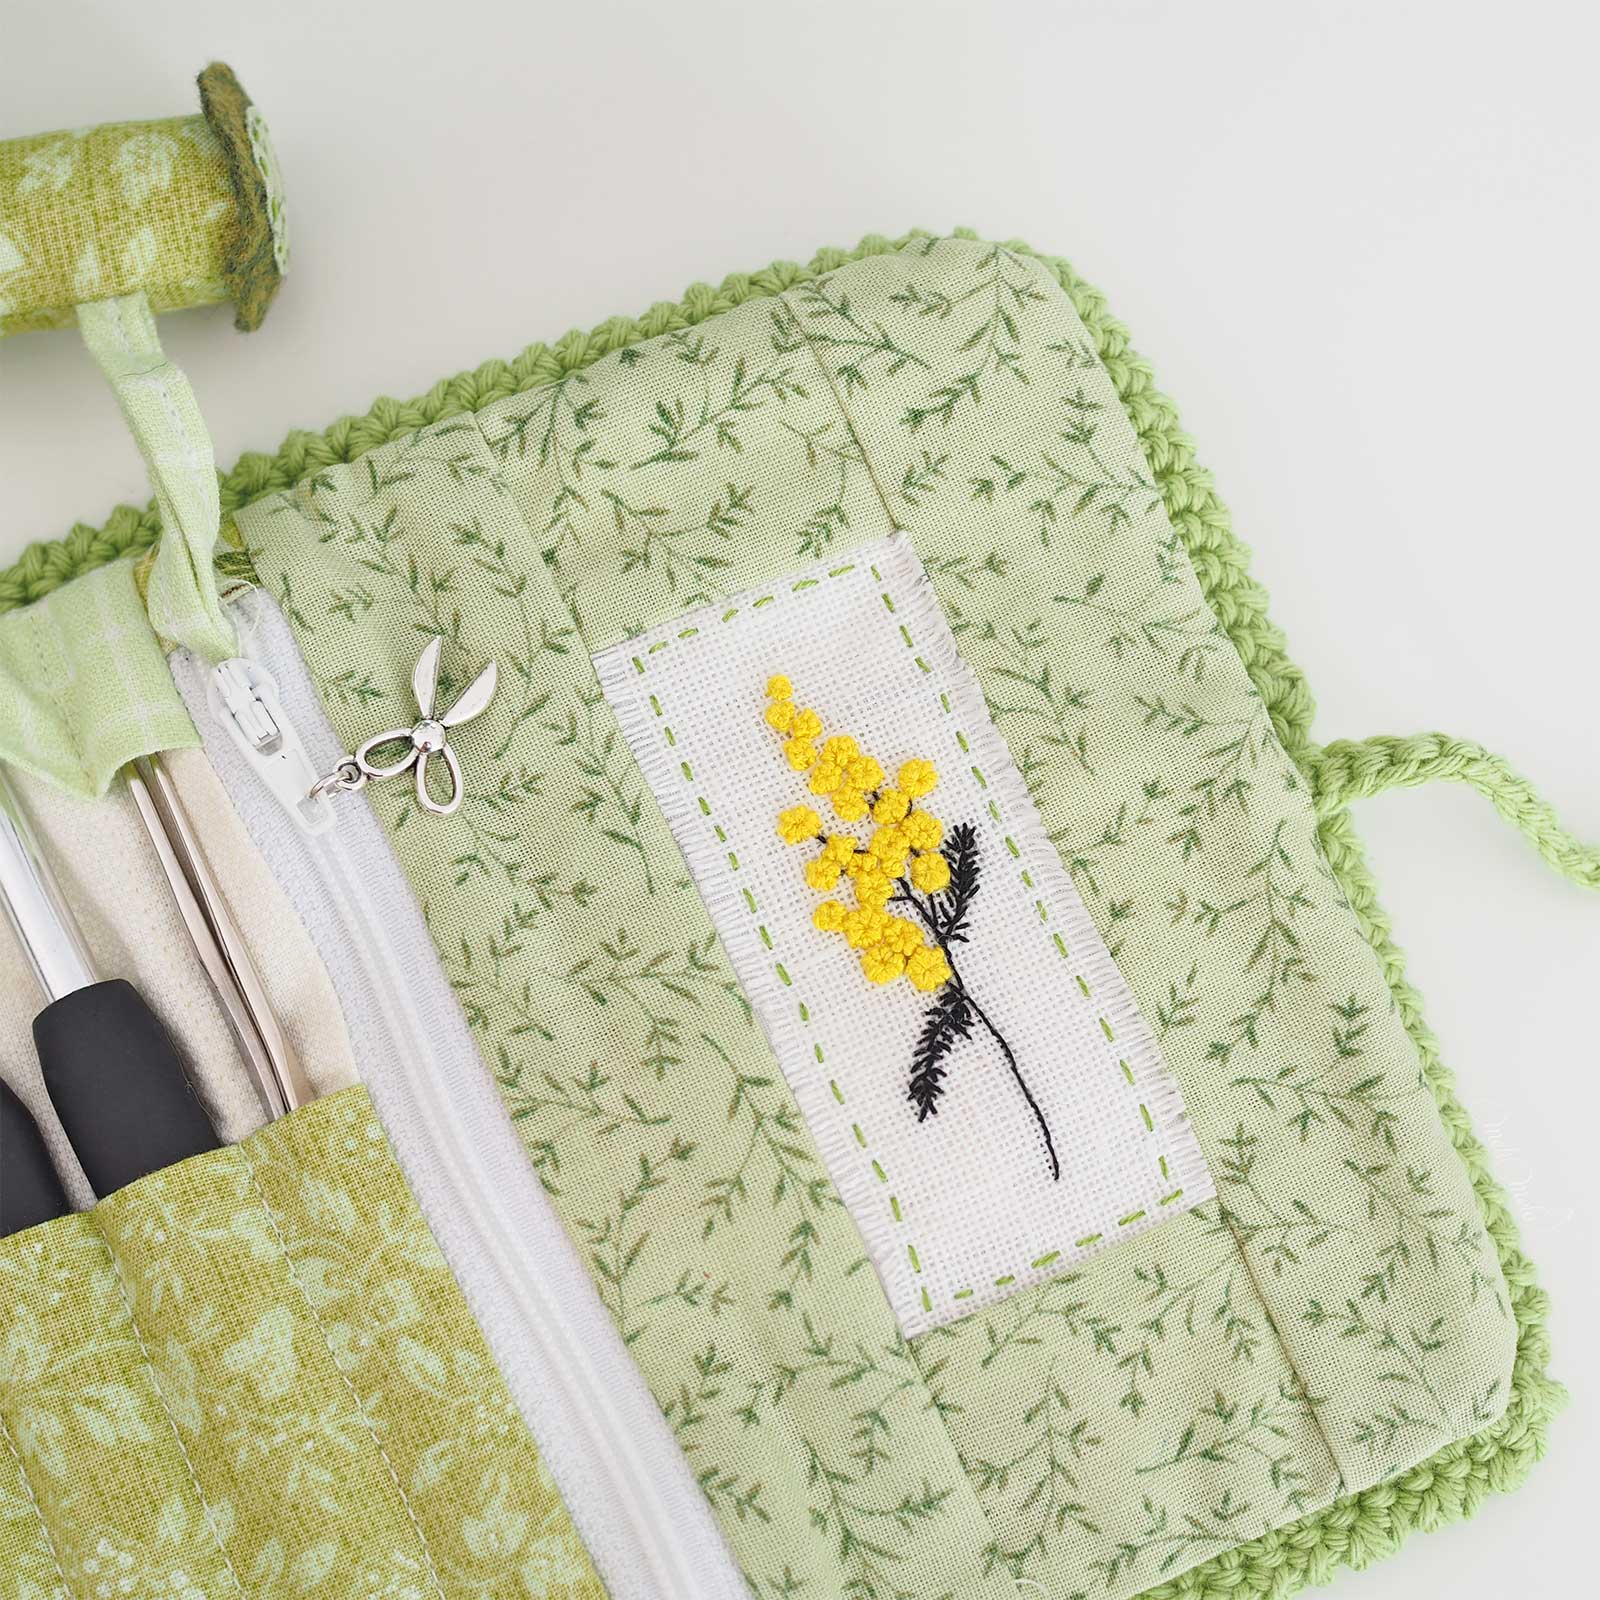 broderie-mimosa-chantal-pochette-crochet-mafabriquebykaro-laboutiquedemelimelo